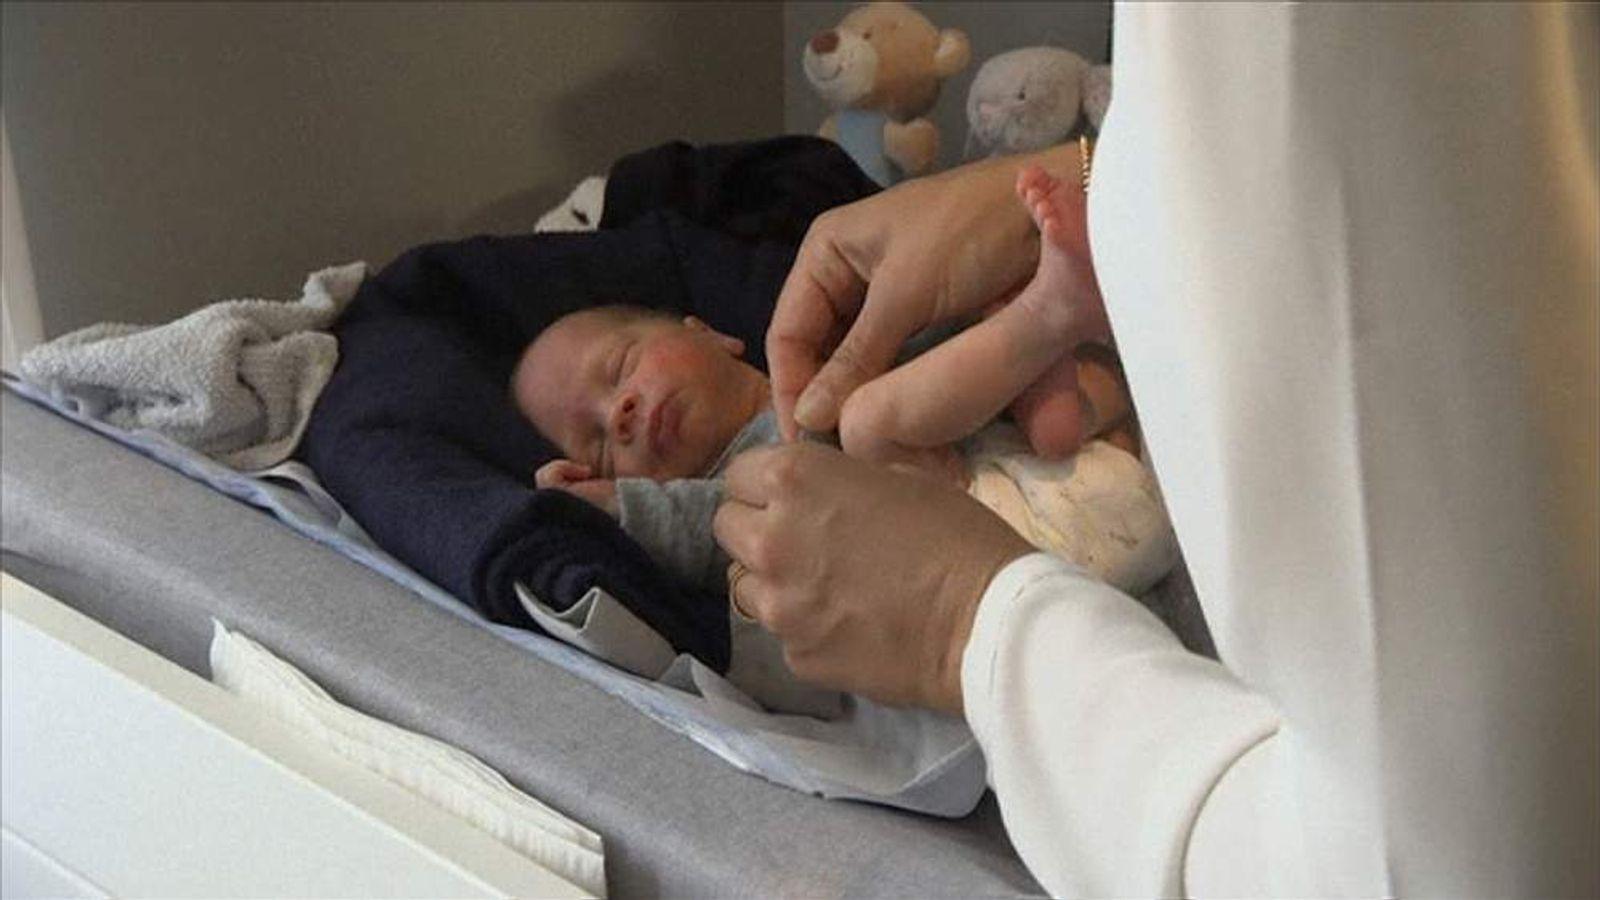 Sweden womb transplant baby